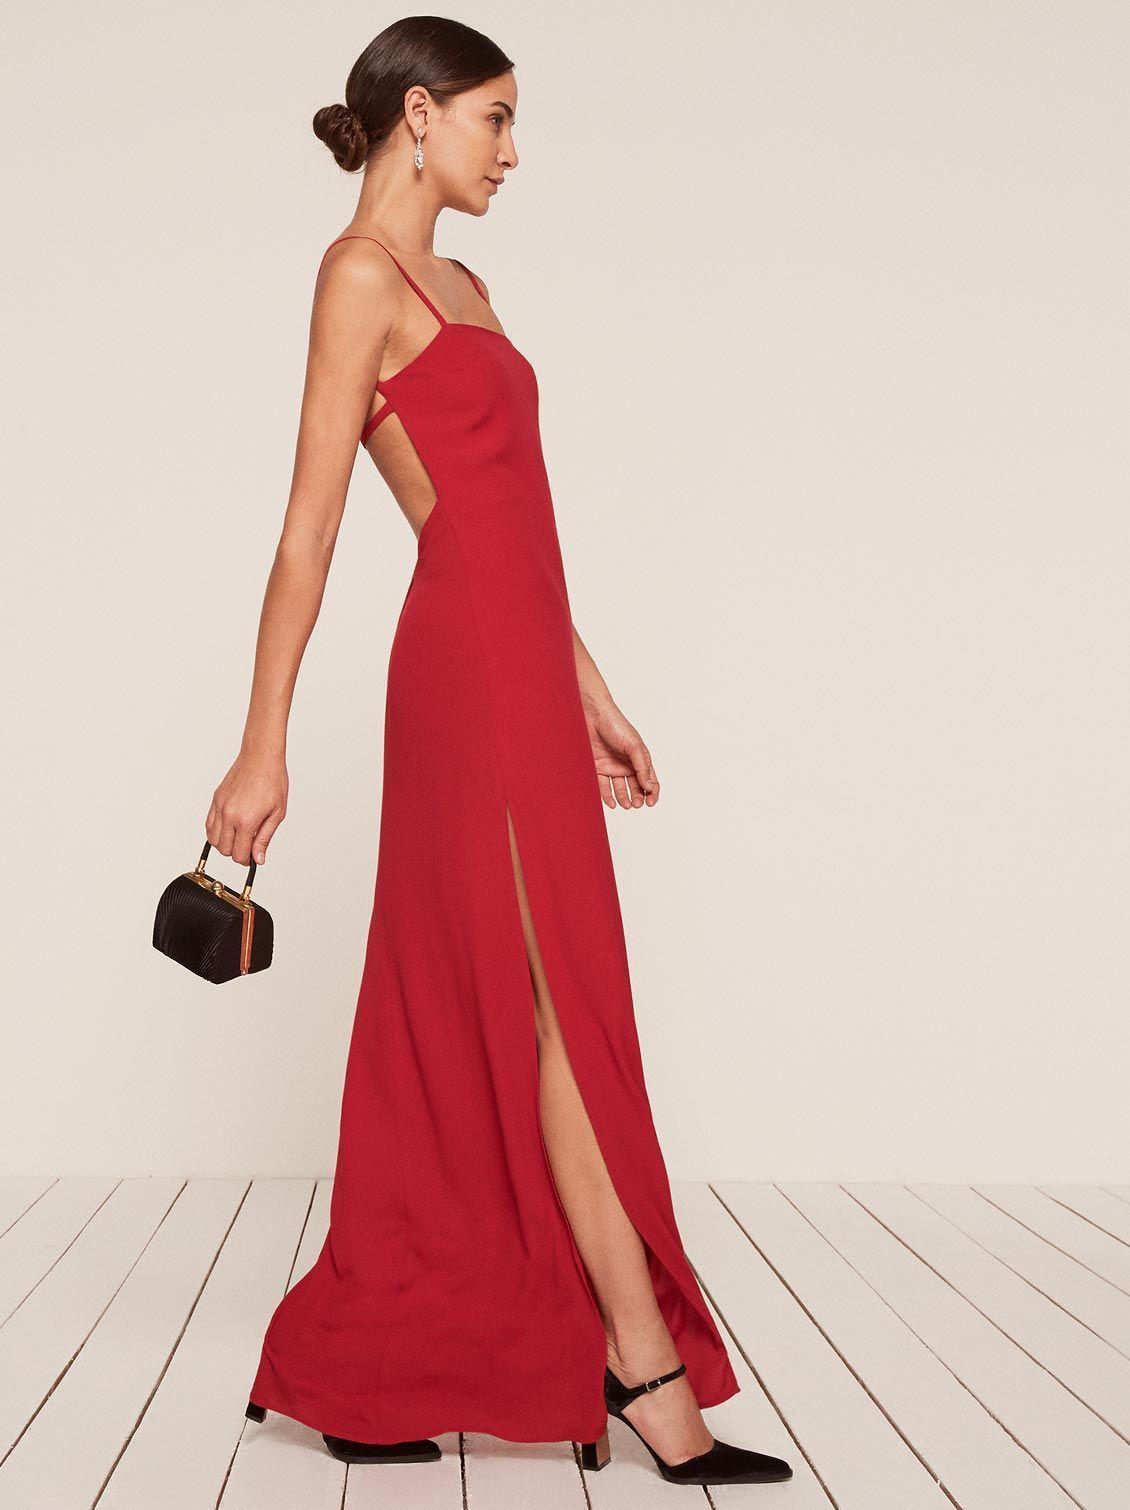 Pisa dress cherry clp pilatesdebutant polished yoga pinterest